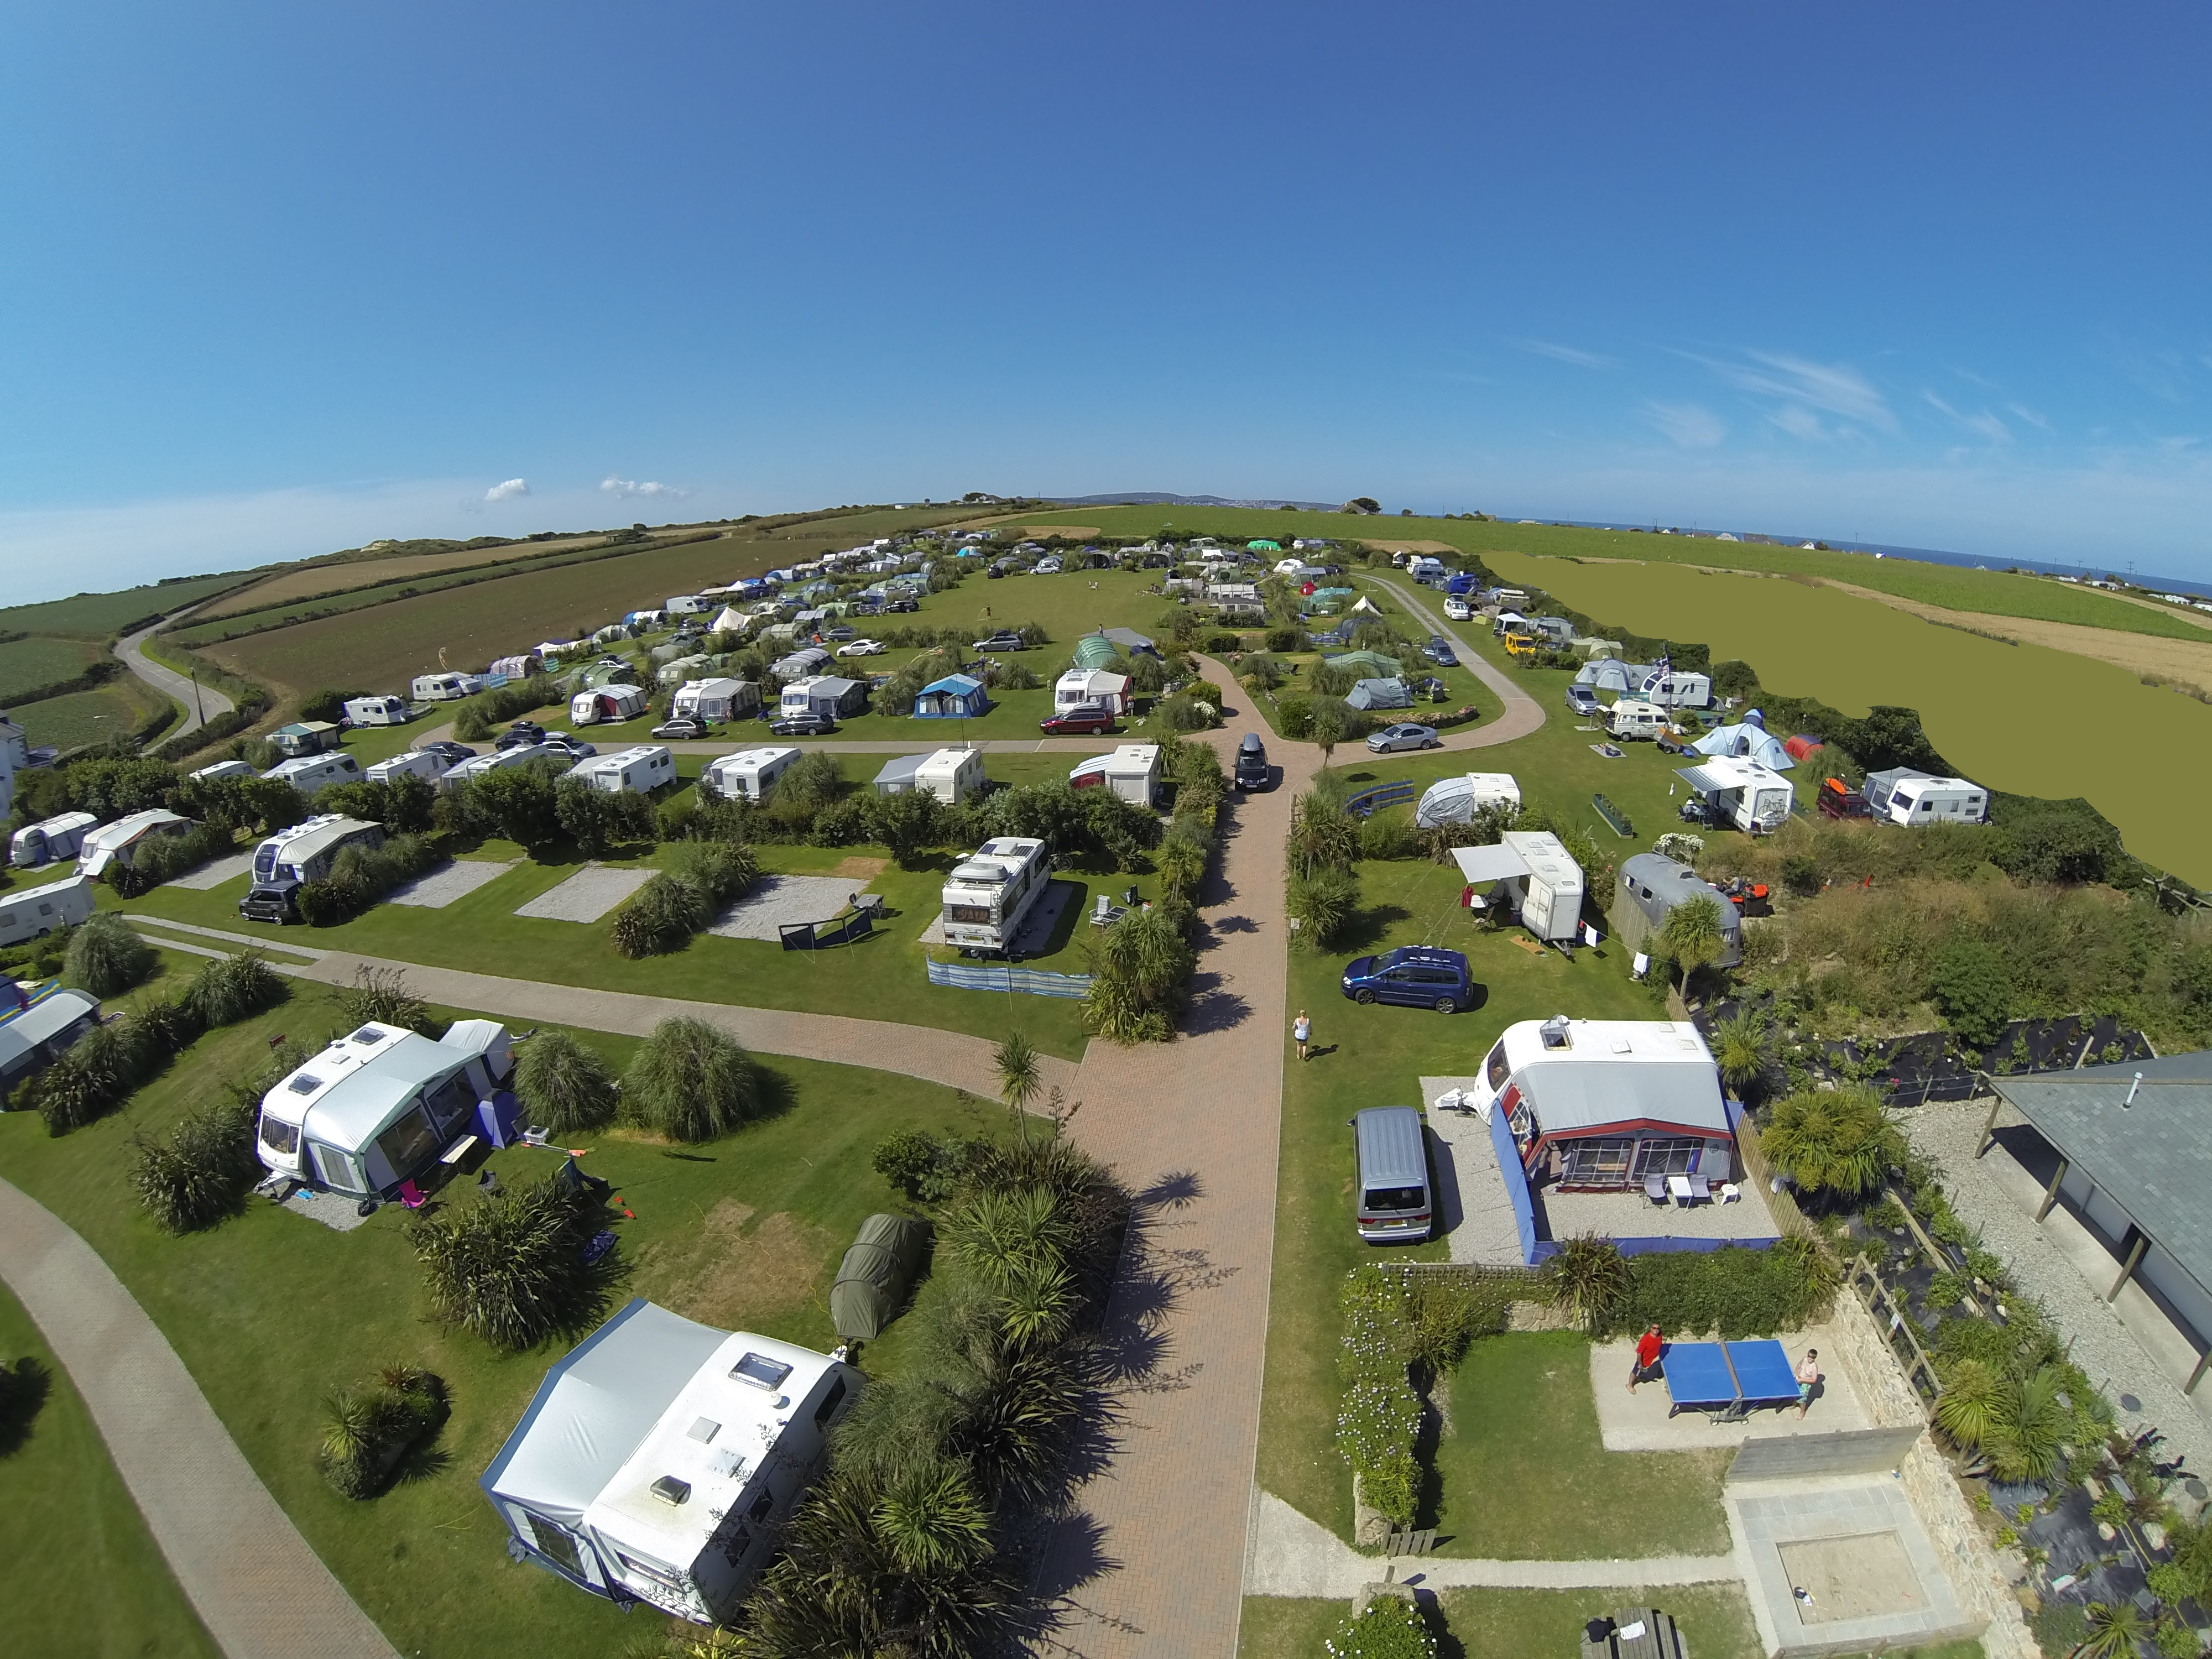 Motorhomes and caravan pitches